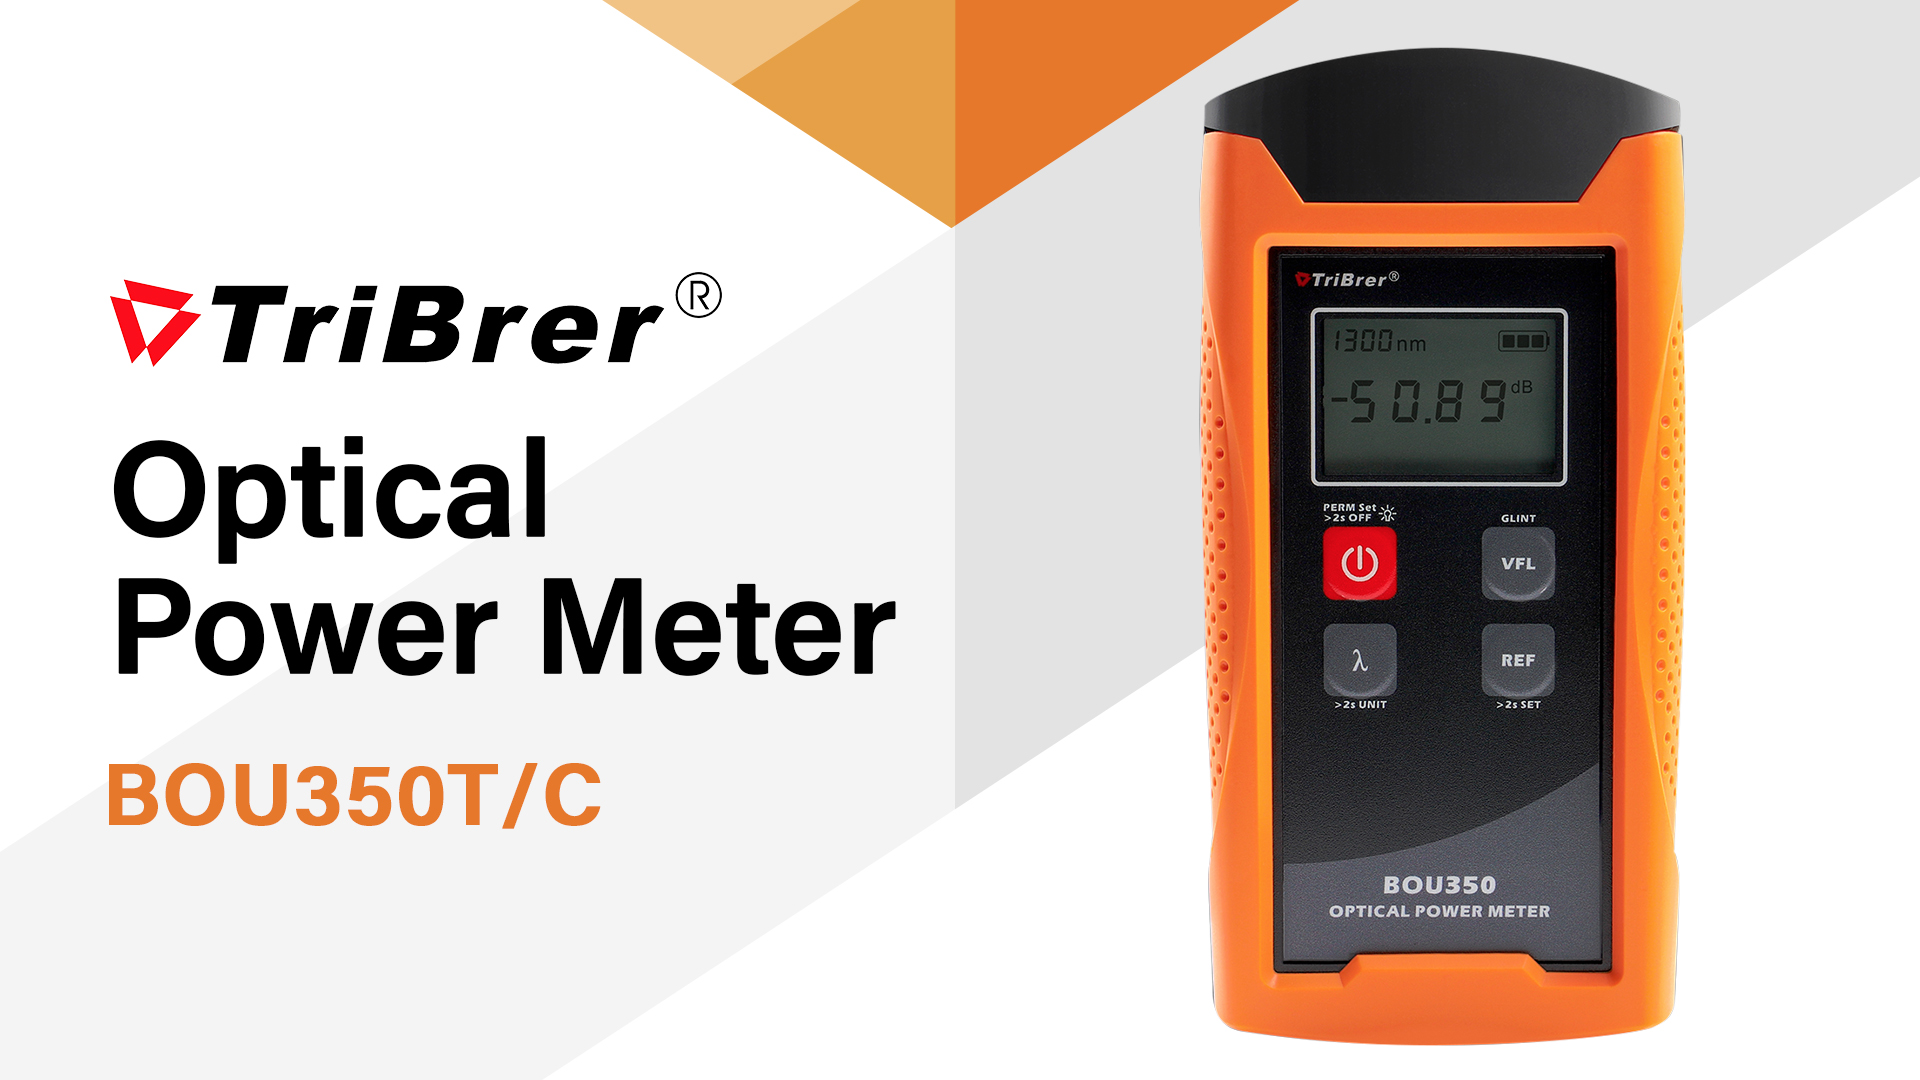 TriBrer BOU350 Optical Power Meter